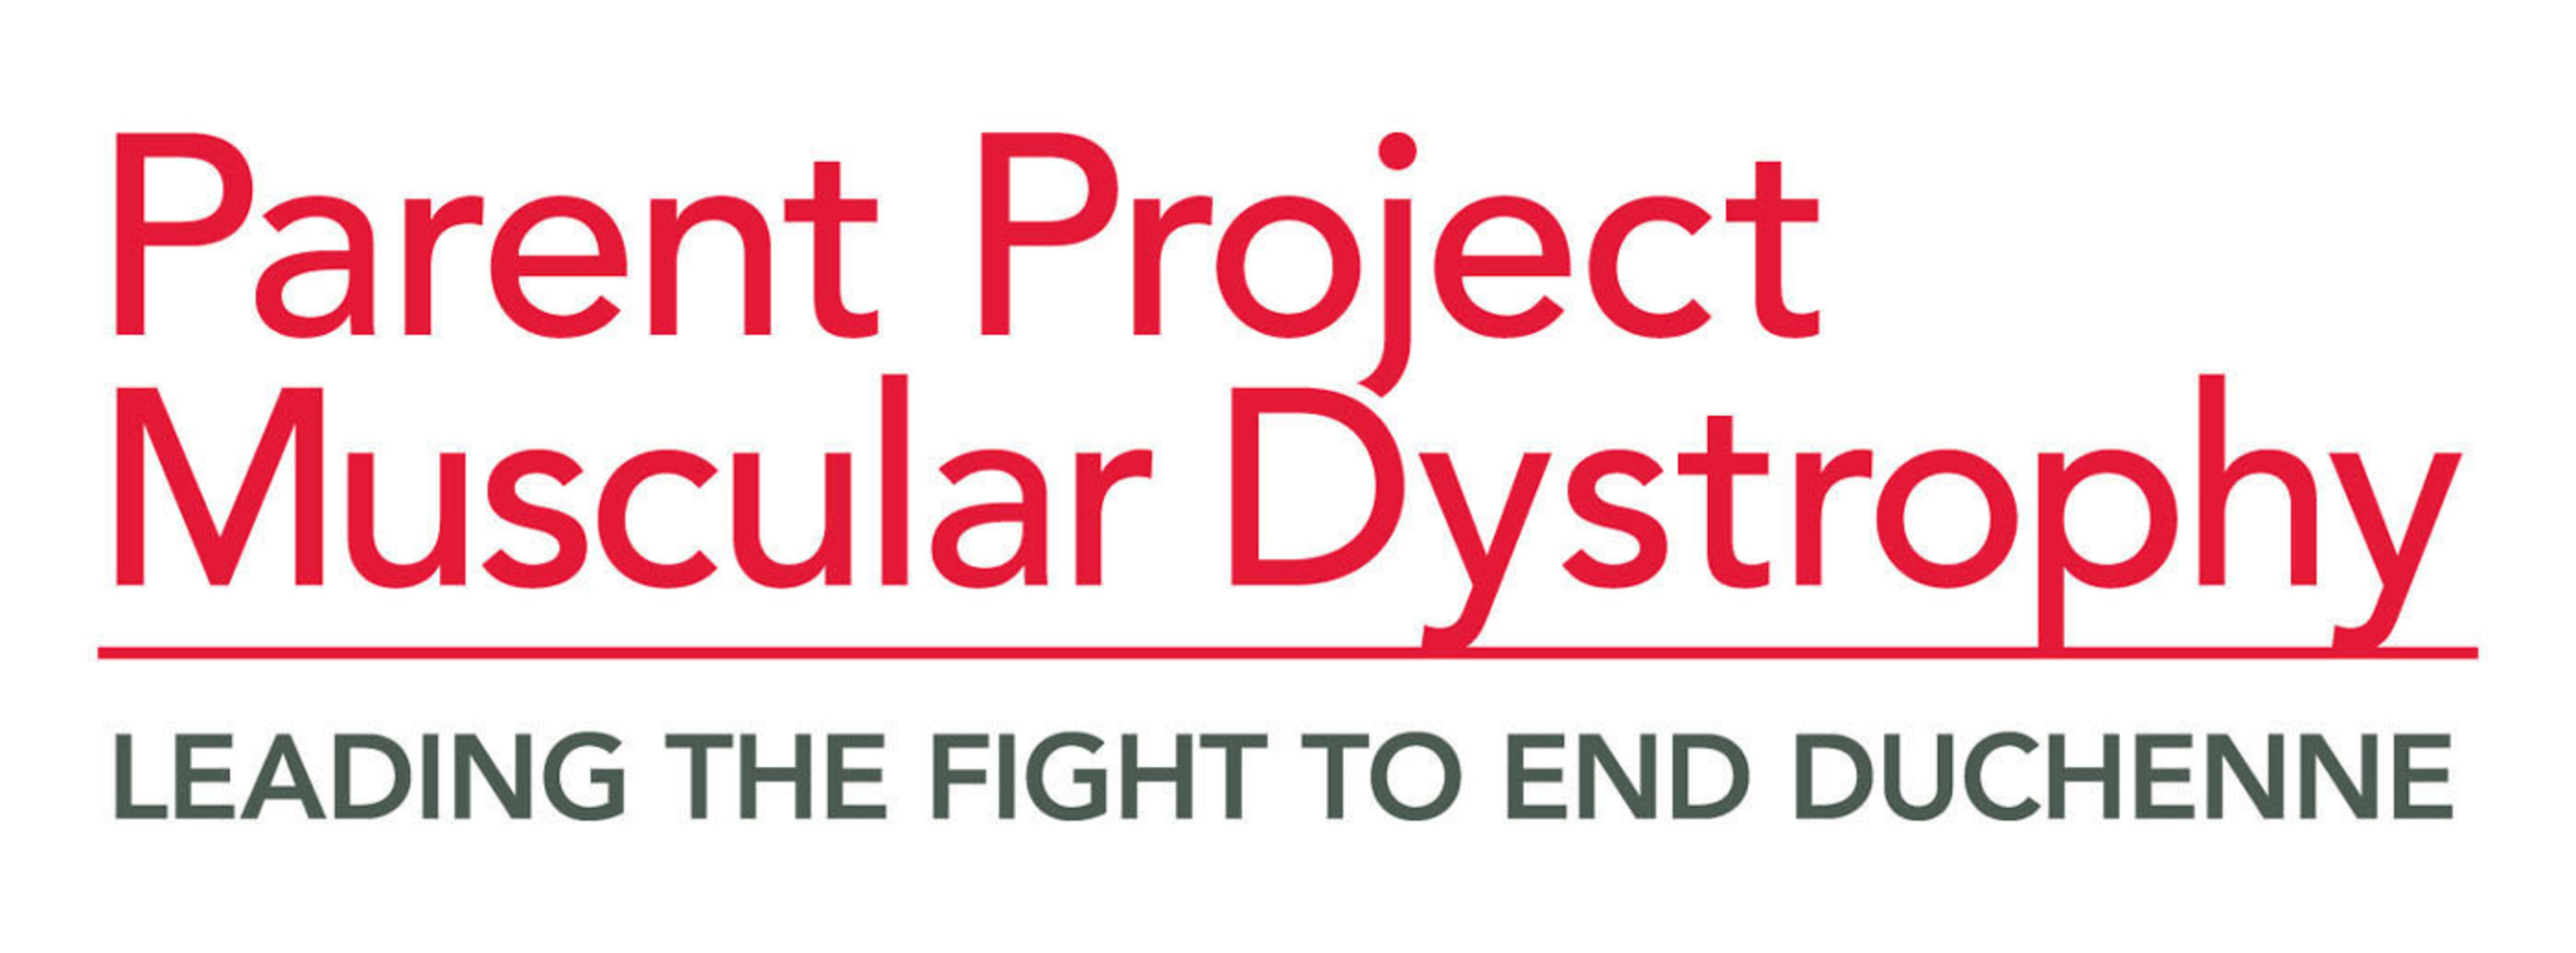 Parent Project Muscular Dystrophy logo.